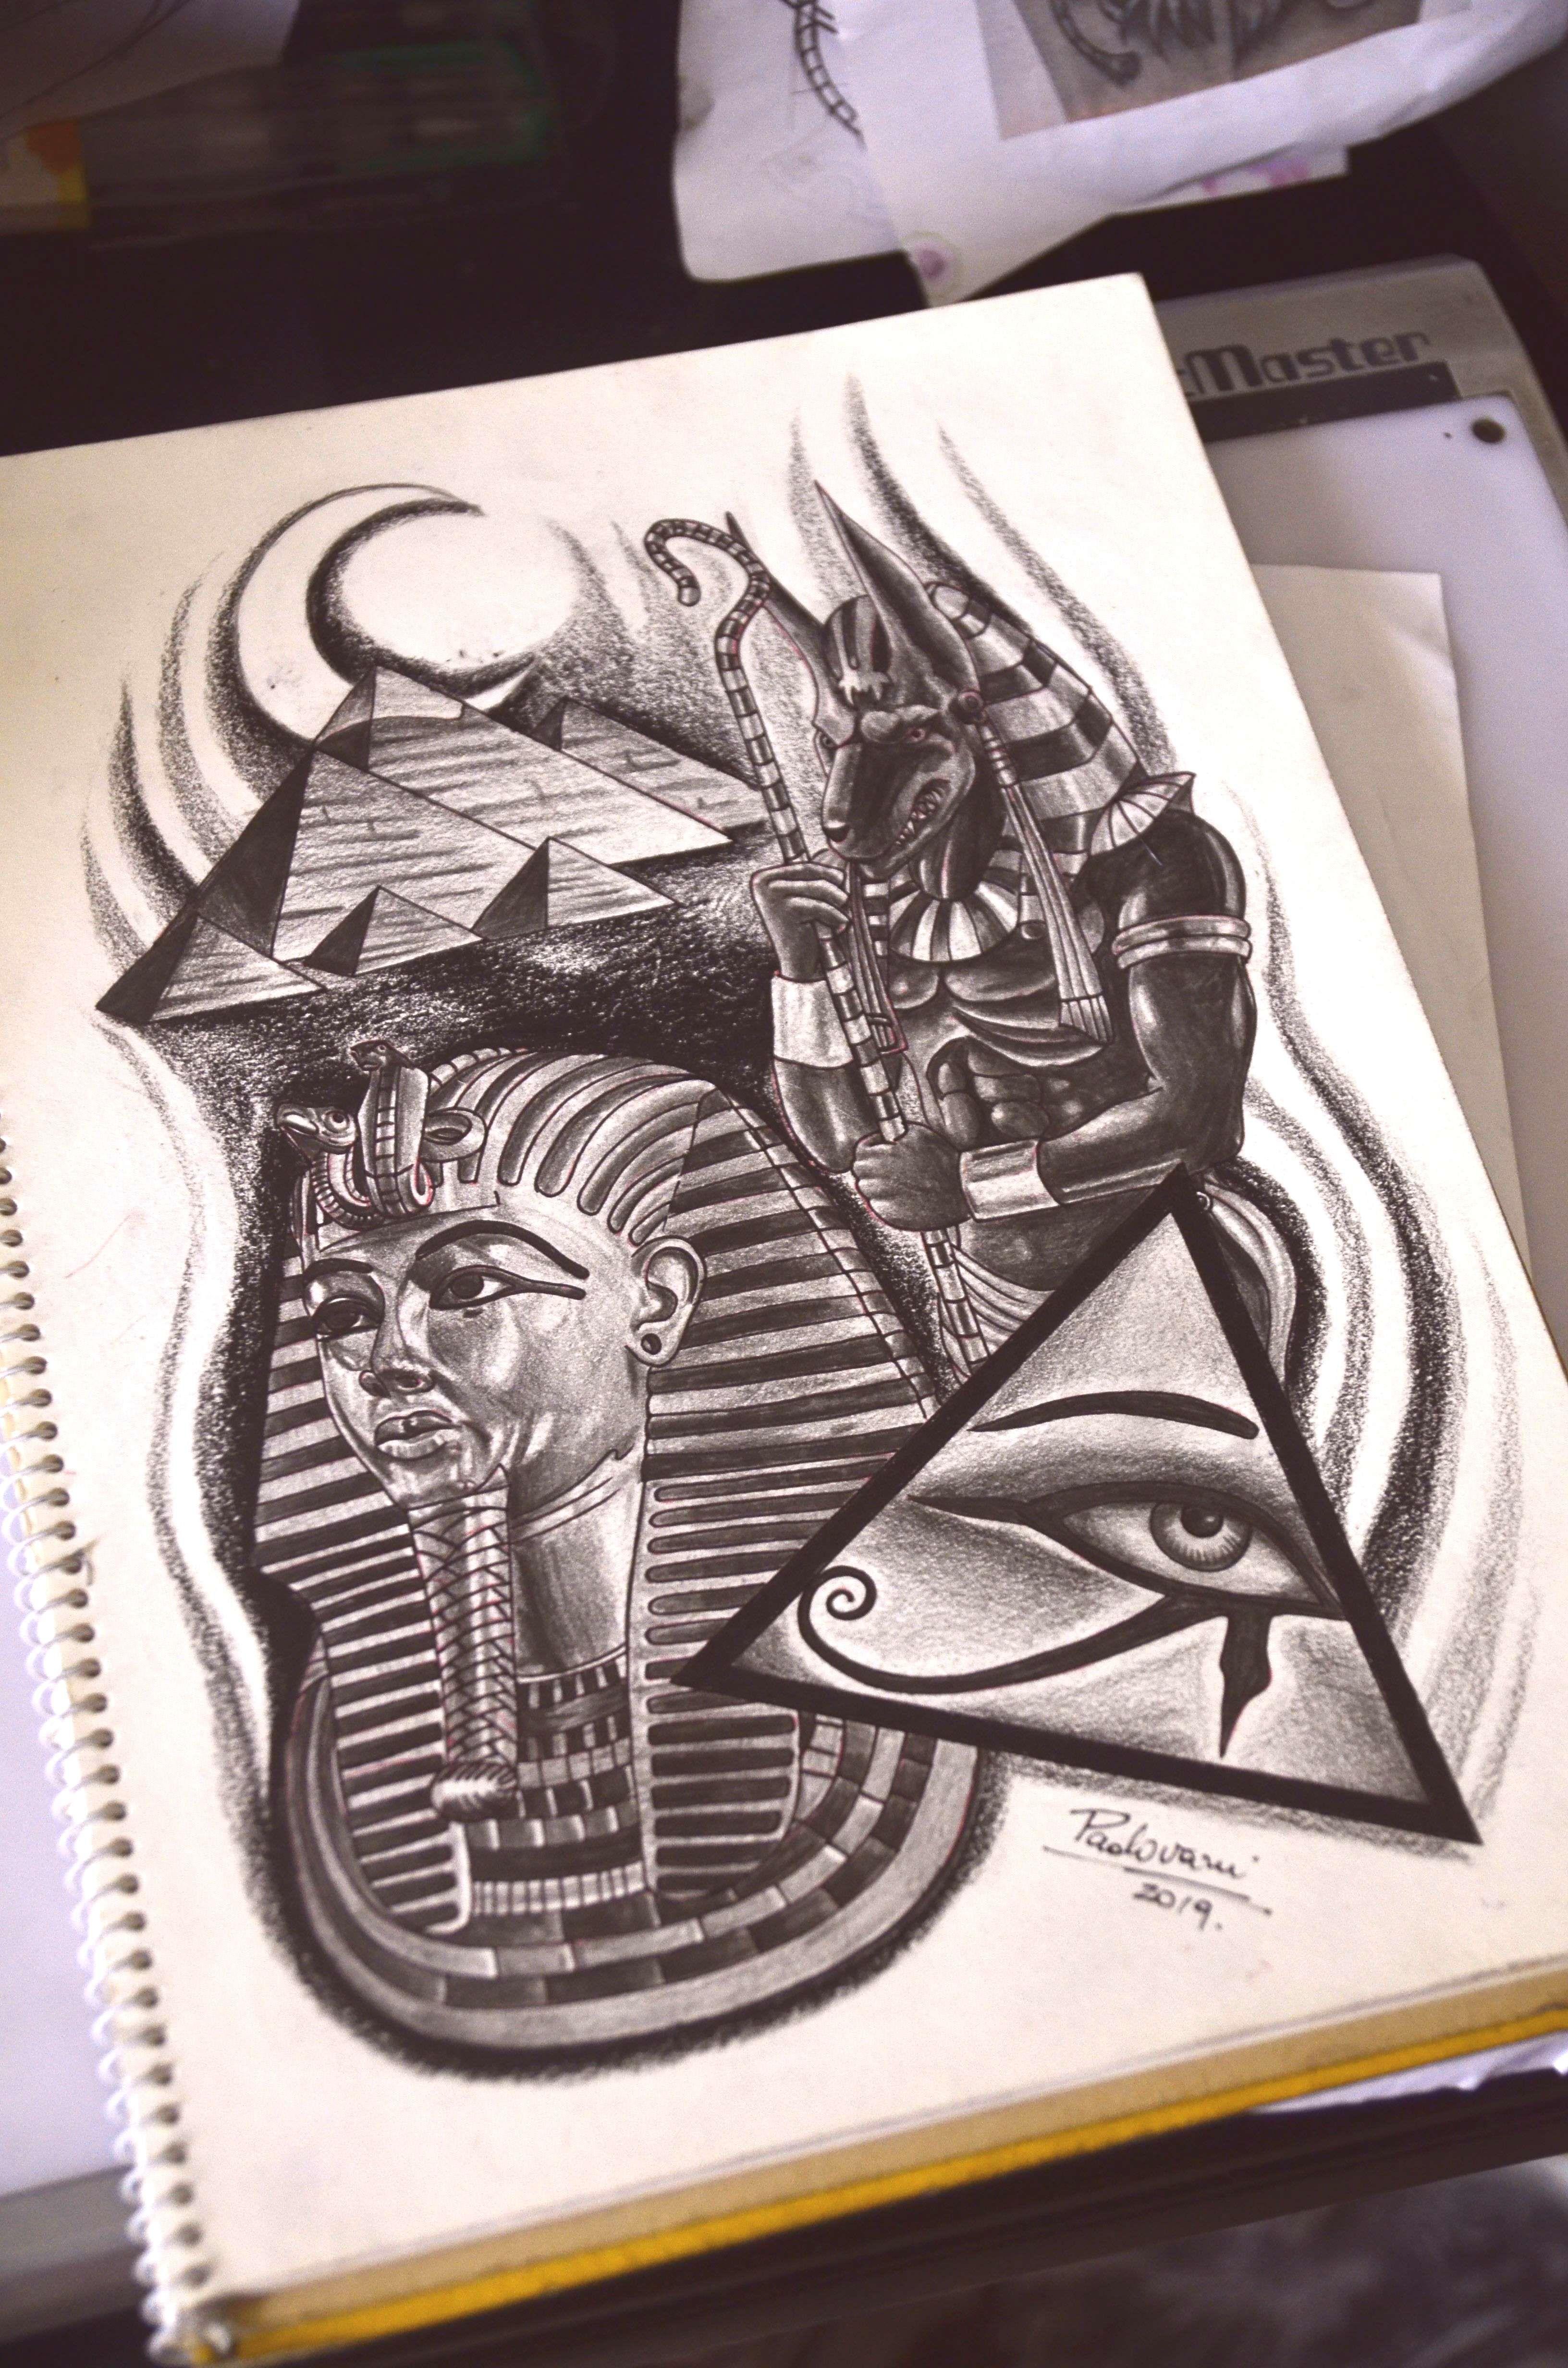 Egypt Tattoo Sketch By Thiago Padovani Egypt Tattoo Sketch By Thiago Padovani In 2020 Egypt Tattoo Egypt Tattoo Design Egyptian Tattoo Sleeve